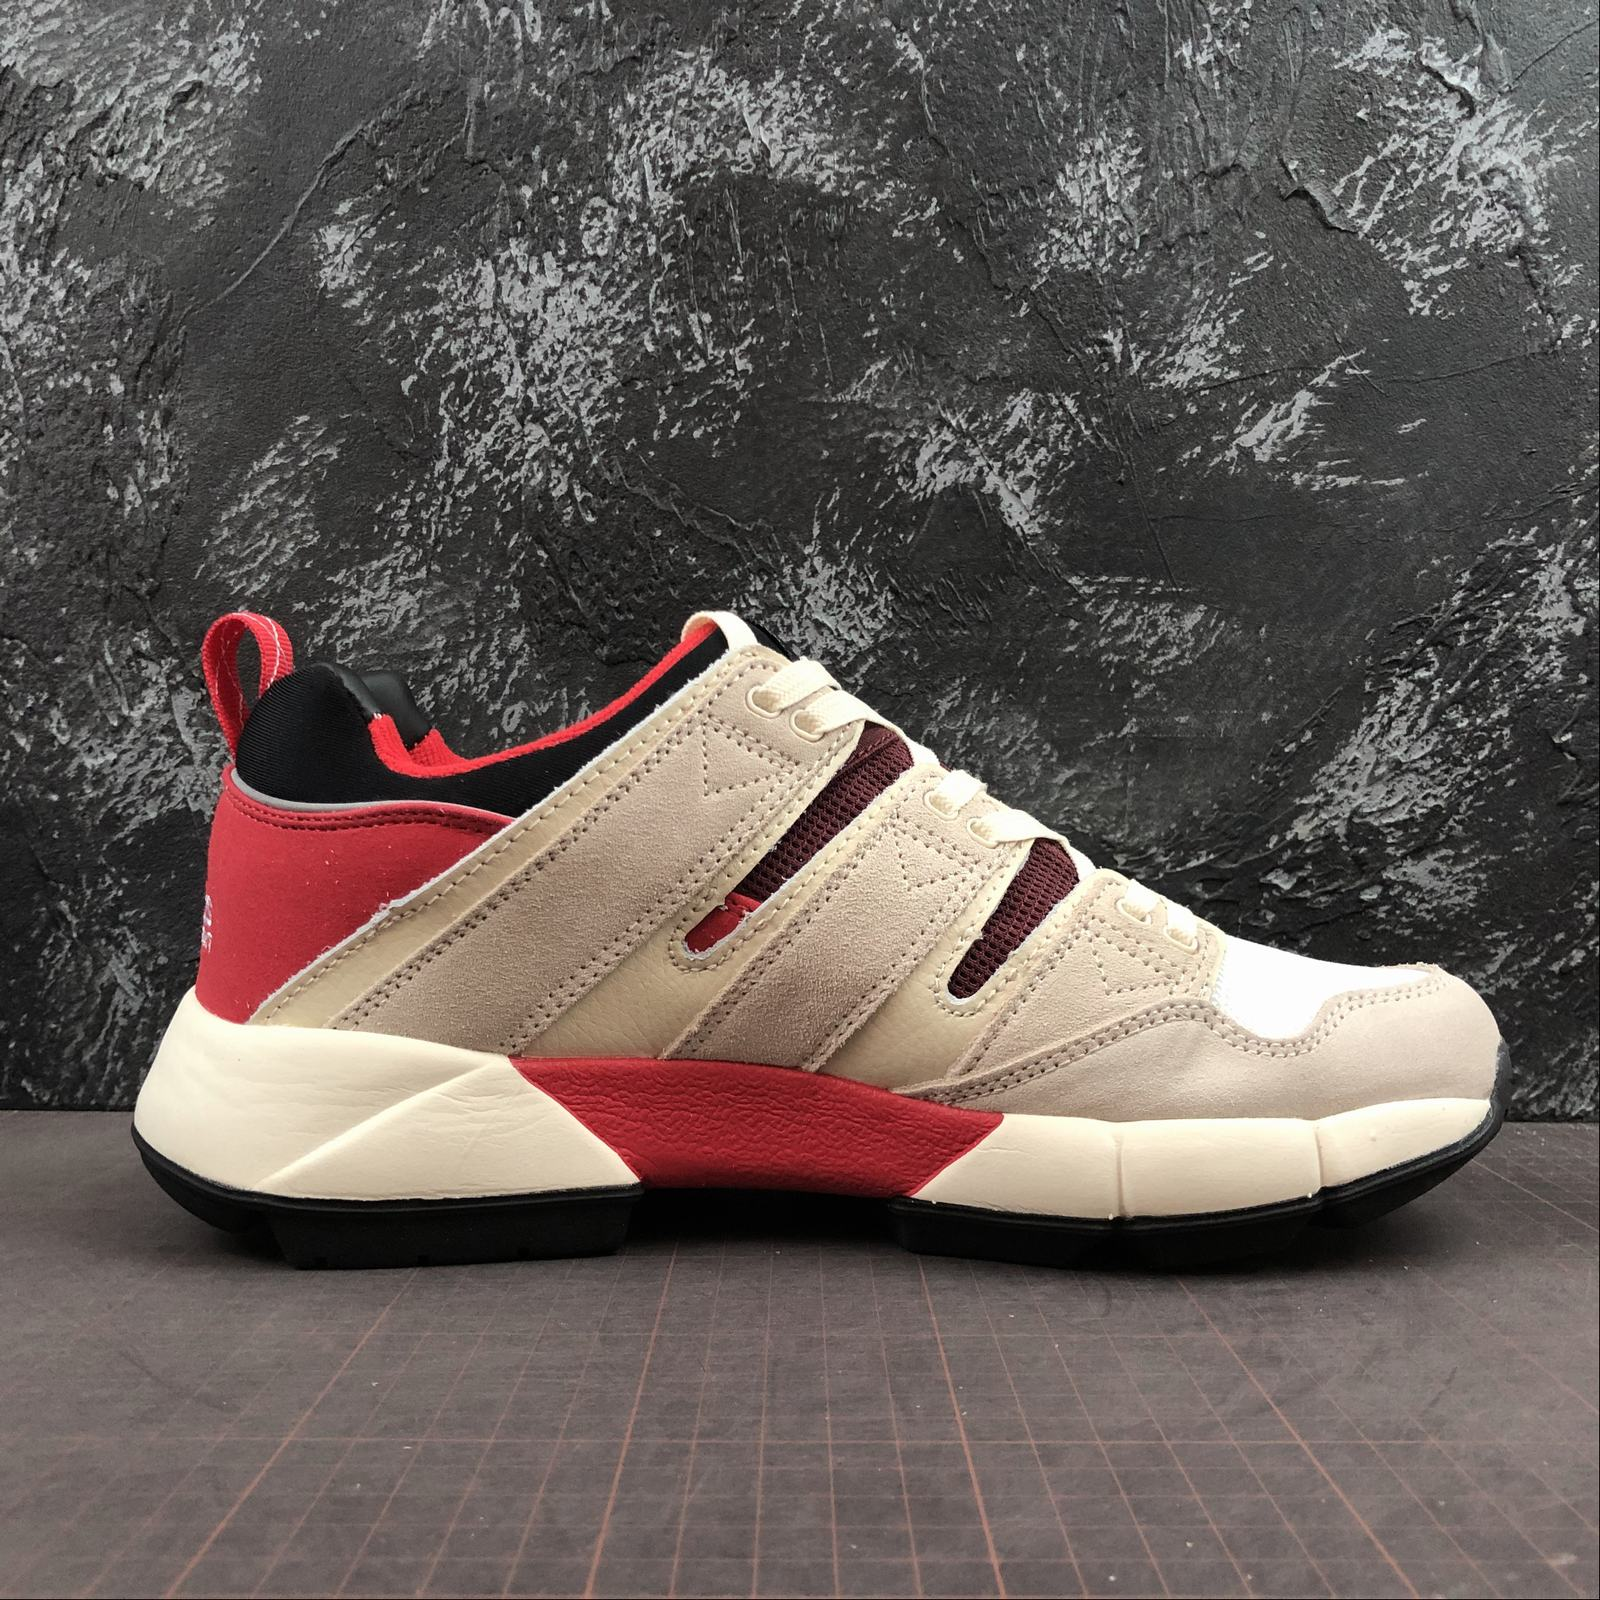 buy online bfde9 b06ad Adidas EQT Cushion 2 Pusha T 阿迪达斯复古休闲跑步鞋DB2717-超 ...